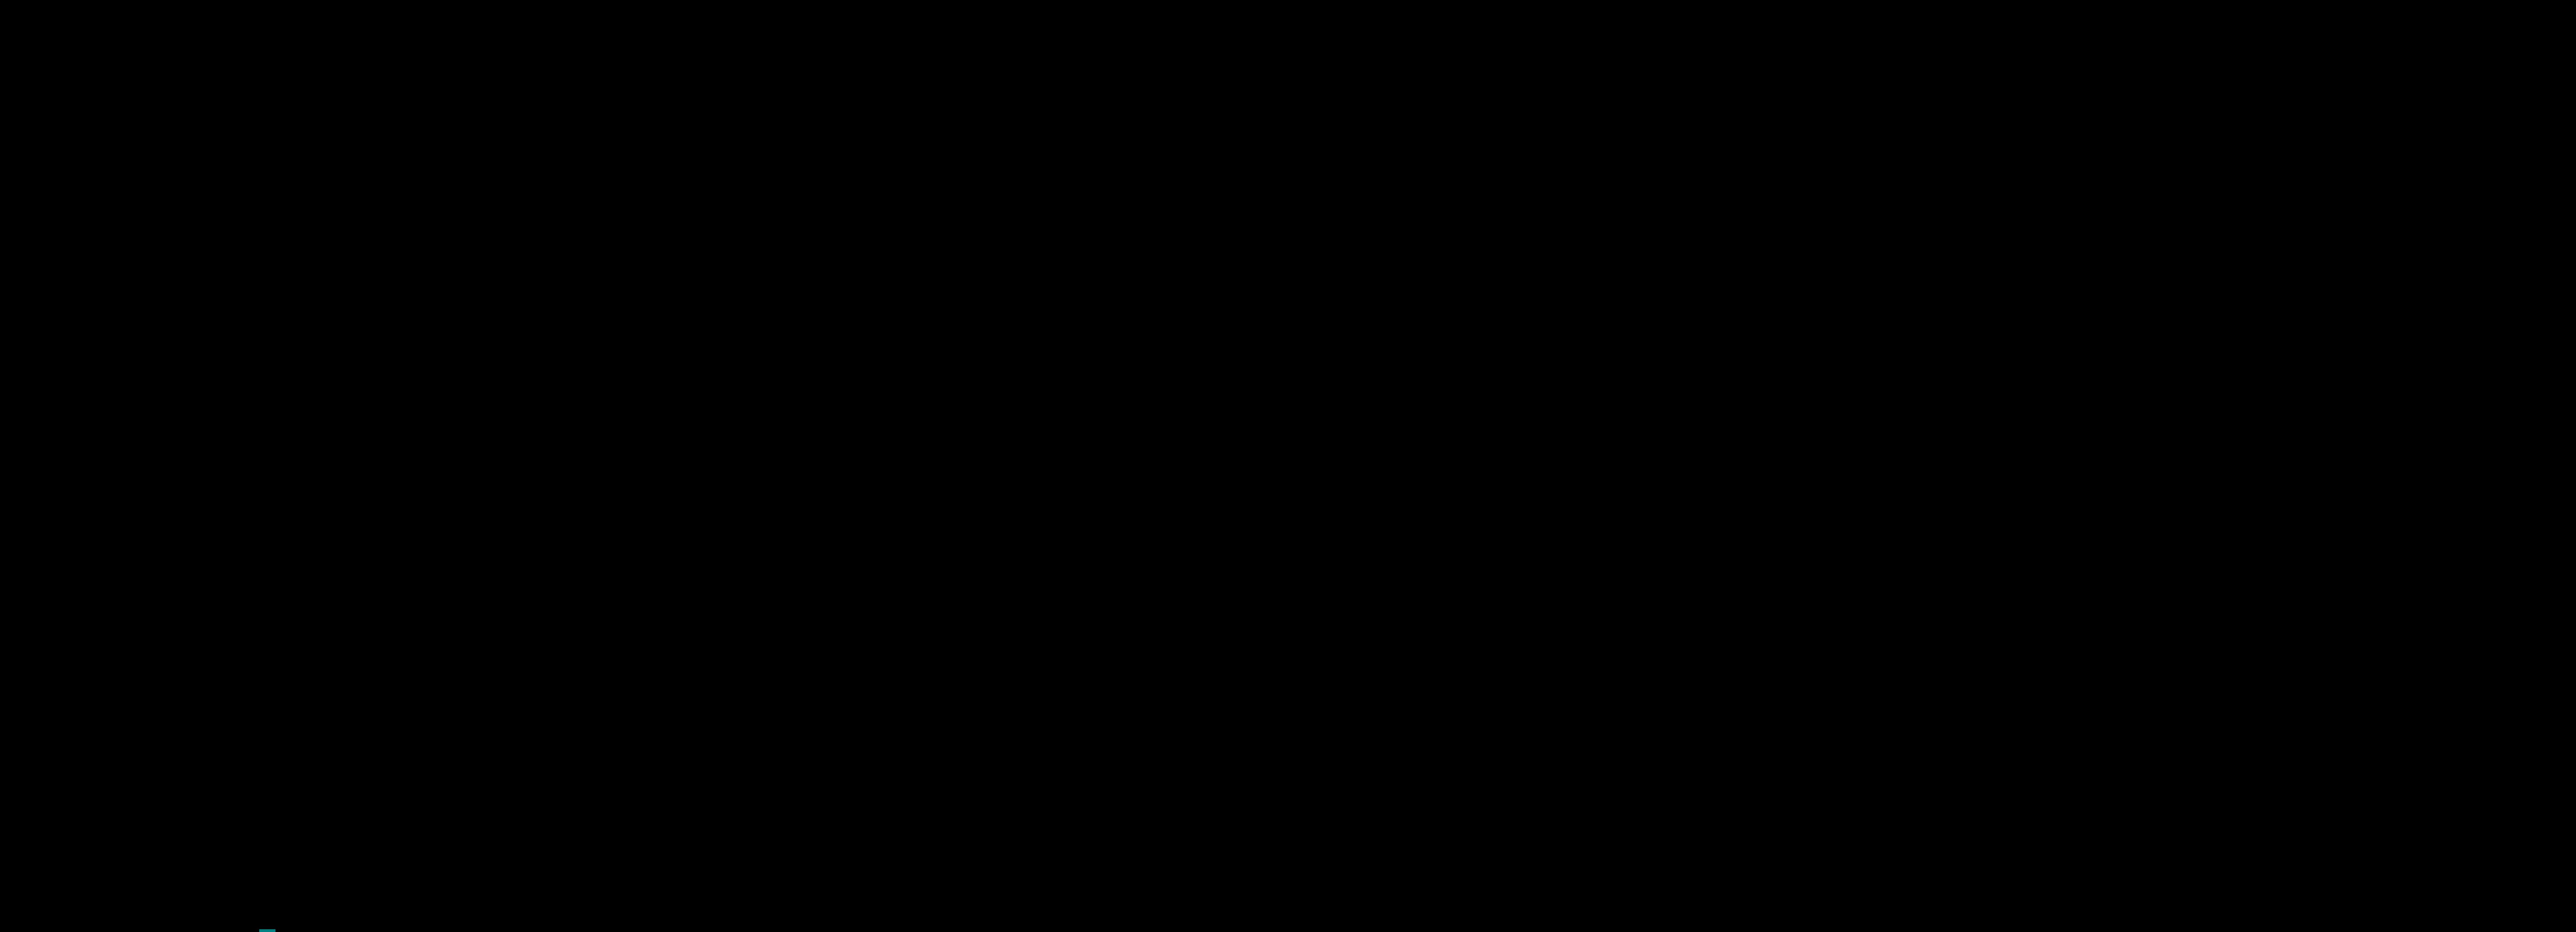 tecladopiano.com-logo-3